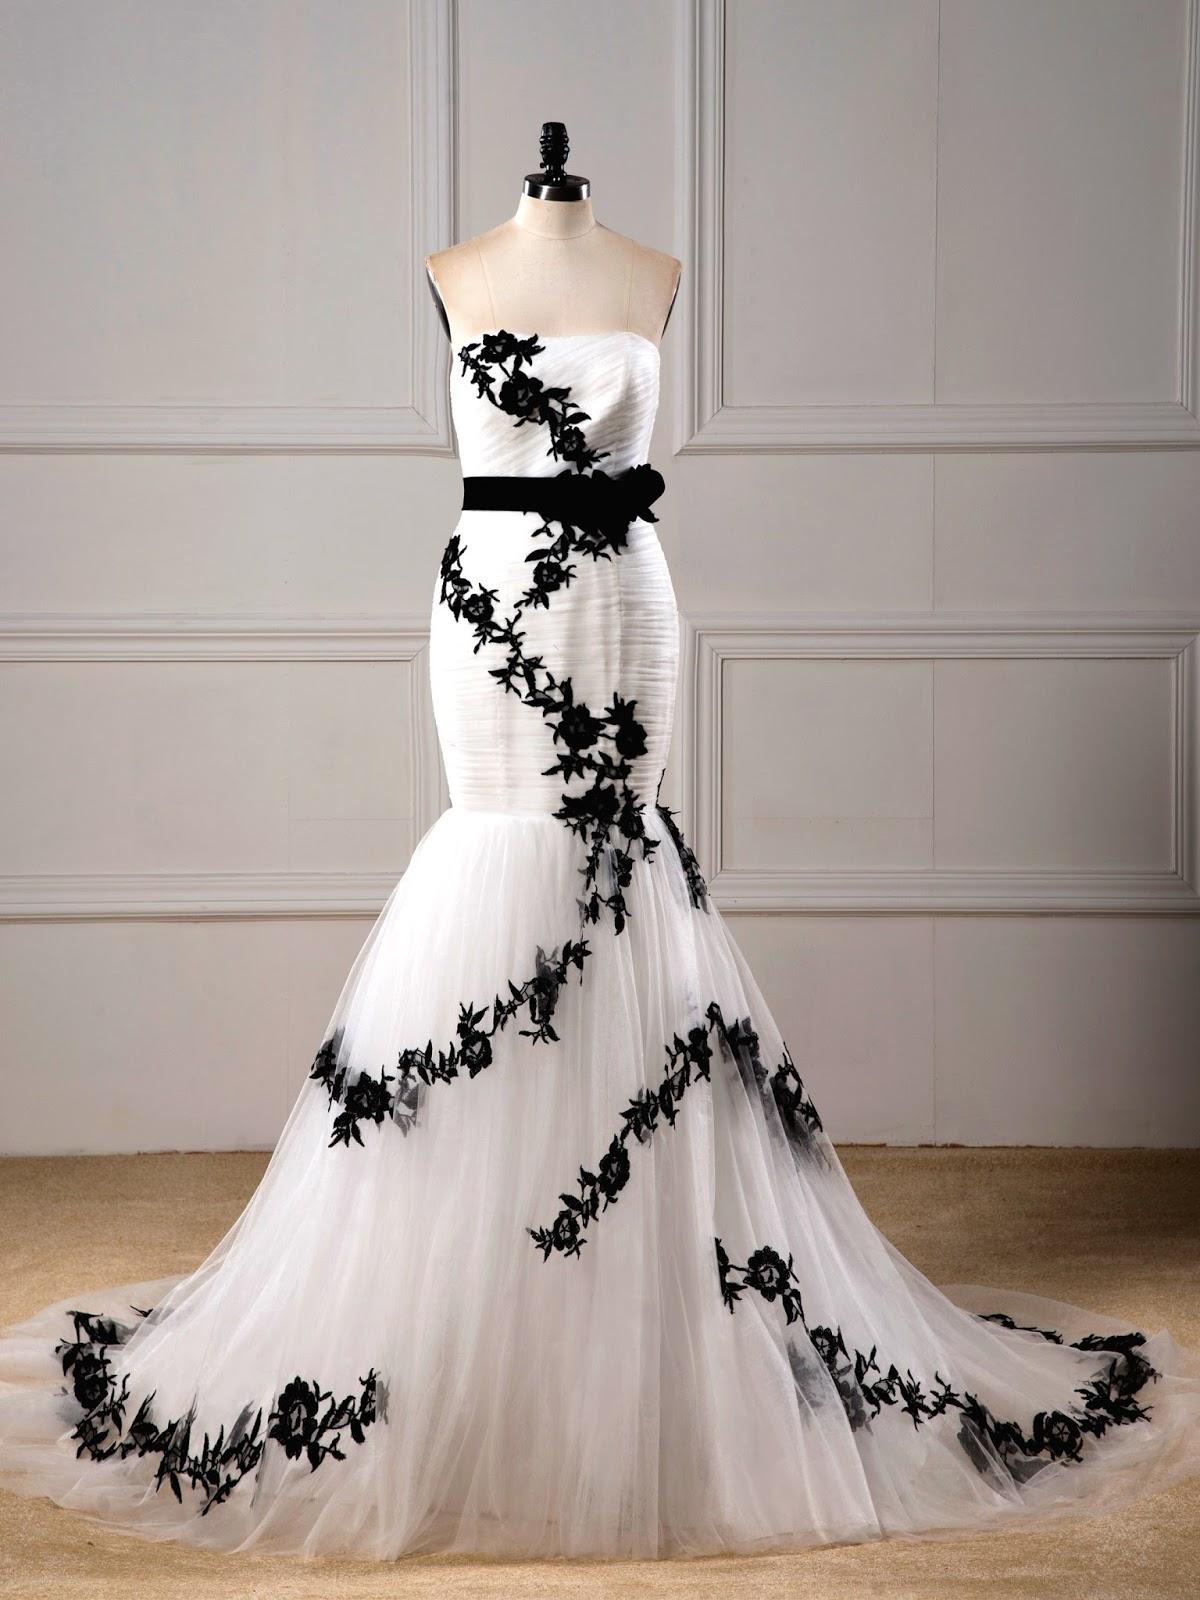 Fashion Sweetheart Trumpet/Mermaid Floor-Length Sleeveless Appliques Ivory Tulle Wedding Dress